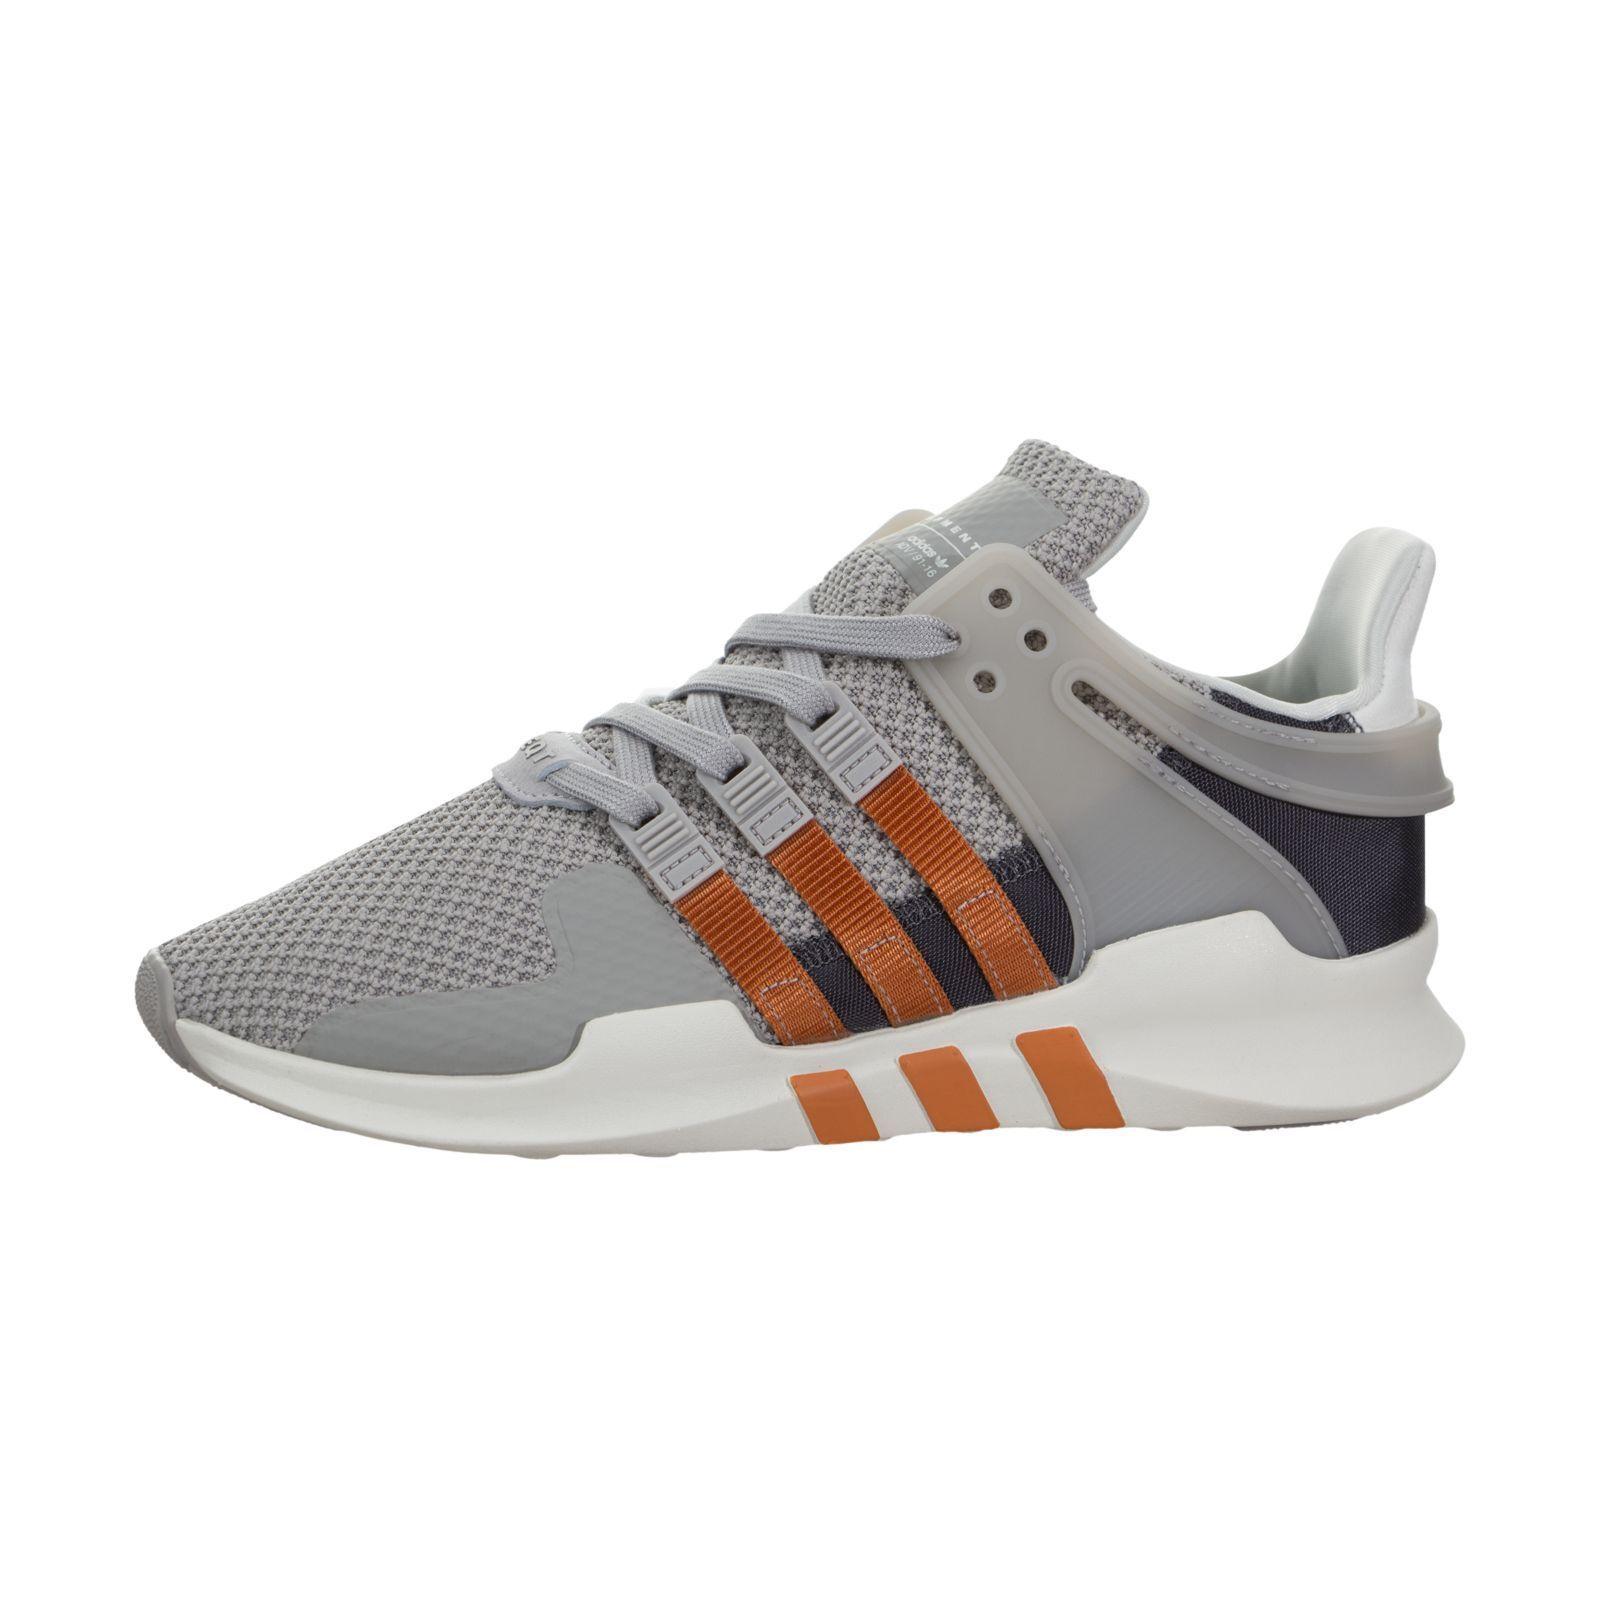 Adidas EQT Support ADV W bb2325